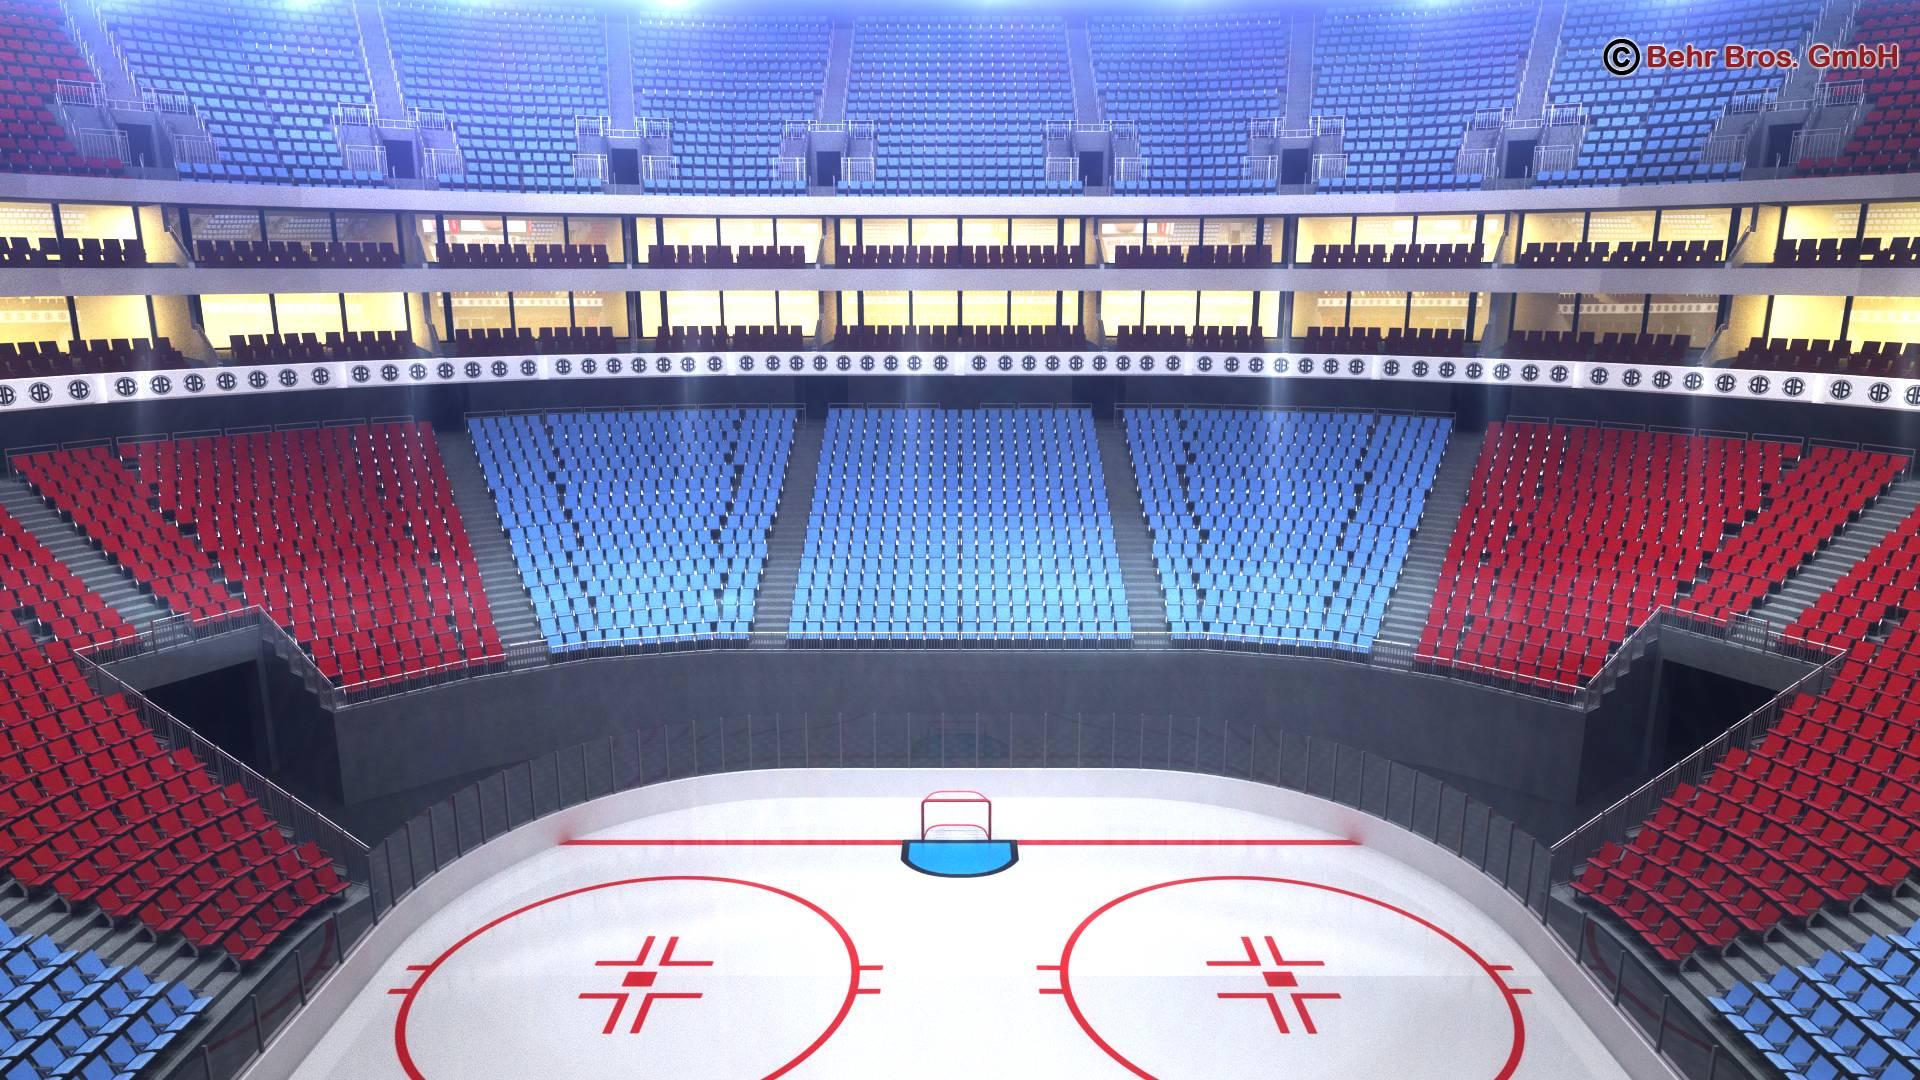 ice hockey arena v2 3d model 3ds max fbx c4d lwo ma mb obj 251658